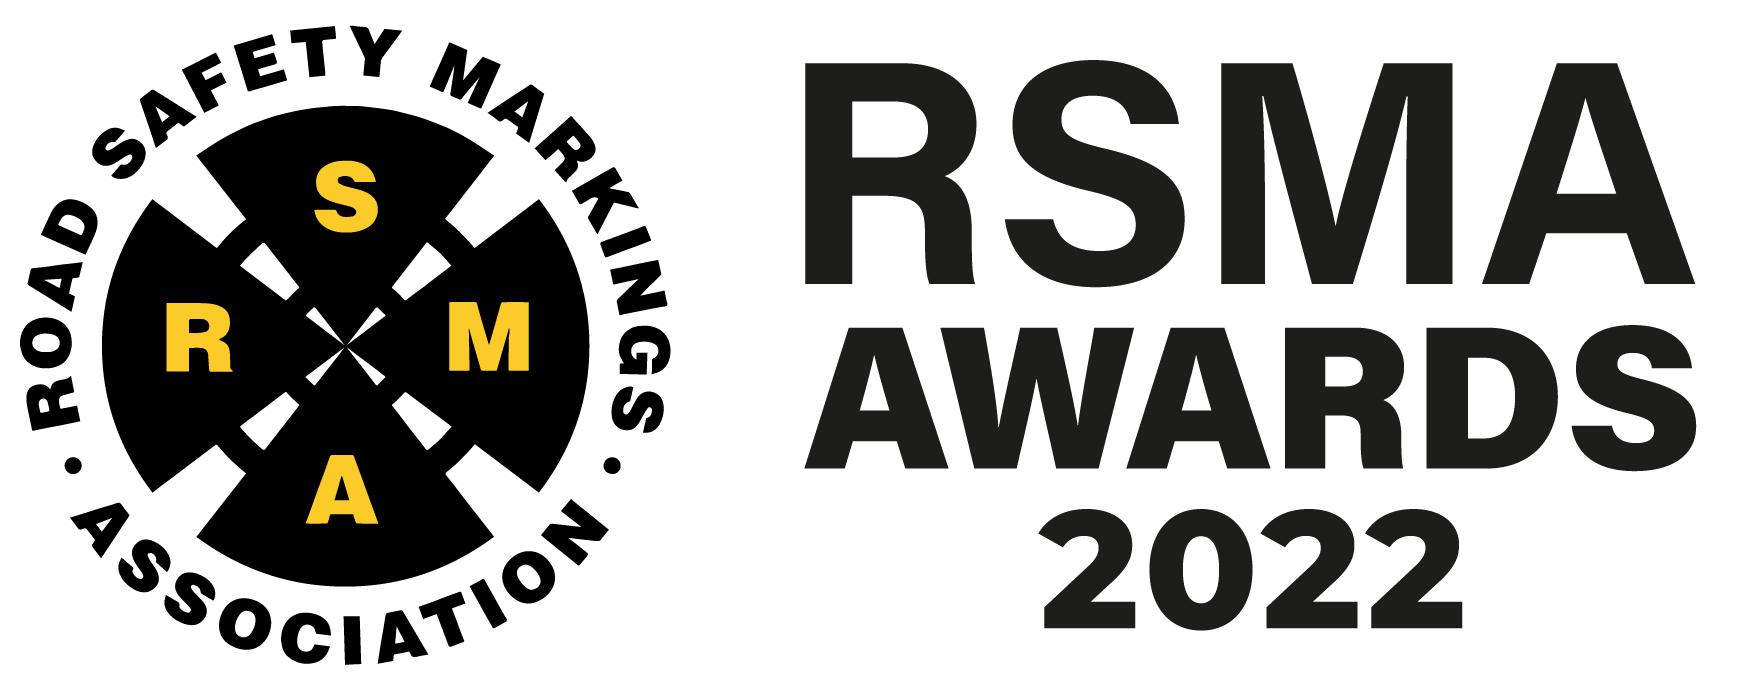 RSMA-AWARDS-BLACK-ON-WHITE-2022